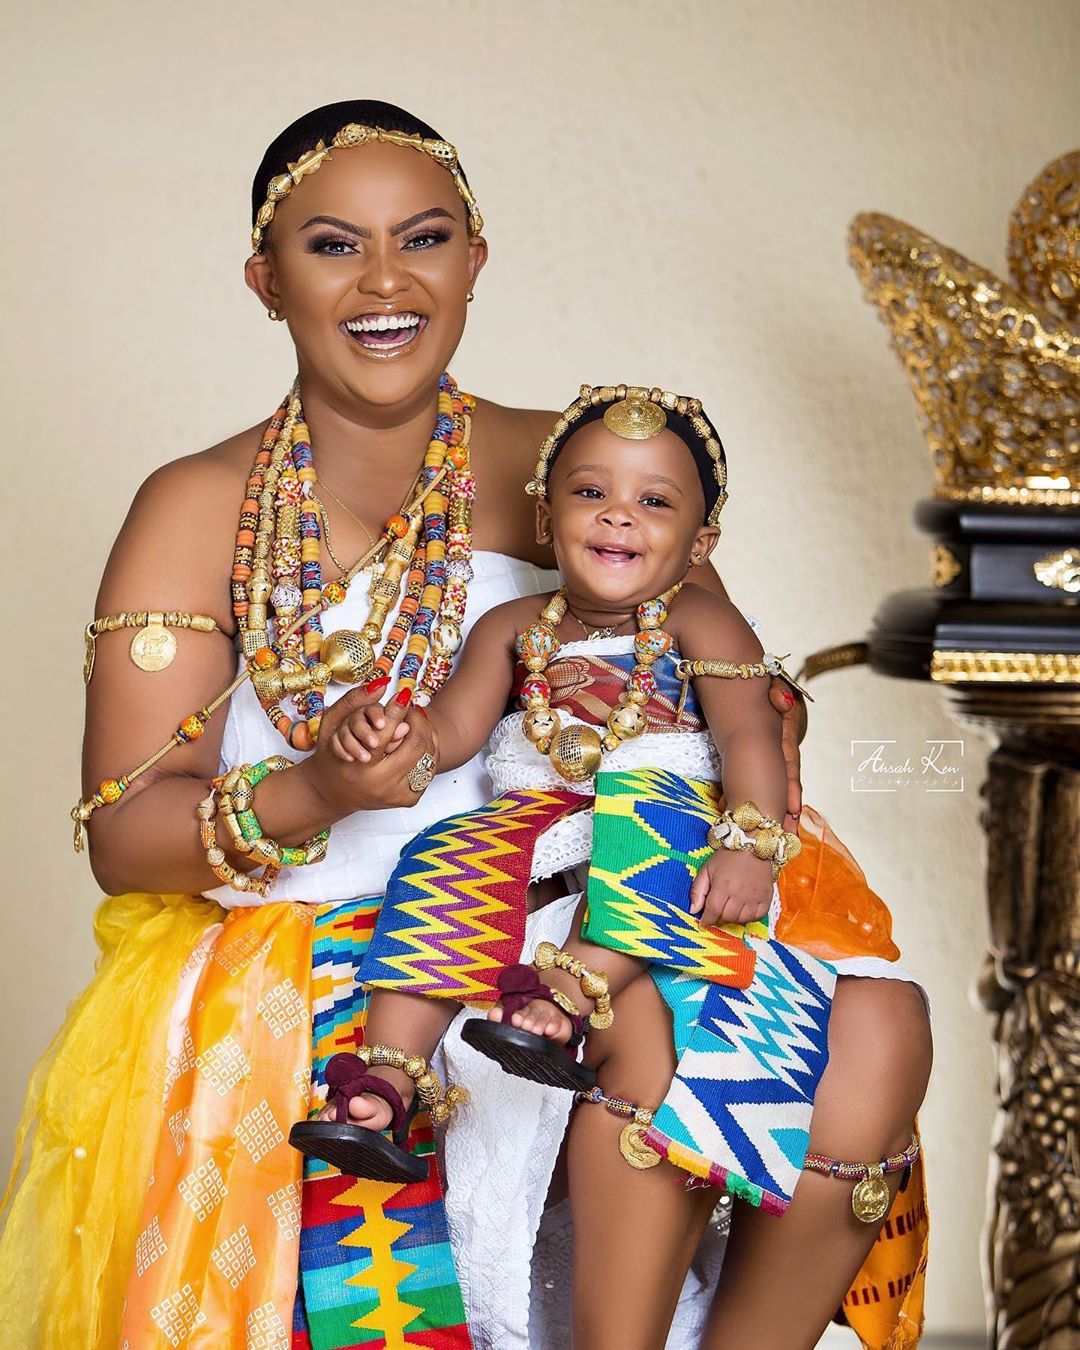 Photos: Nana Ama McBrown celebrates her baby's first birthday